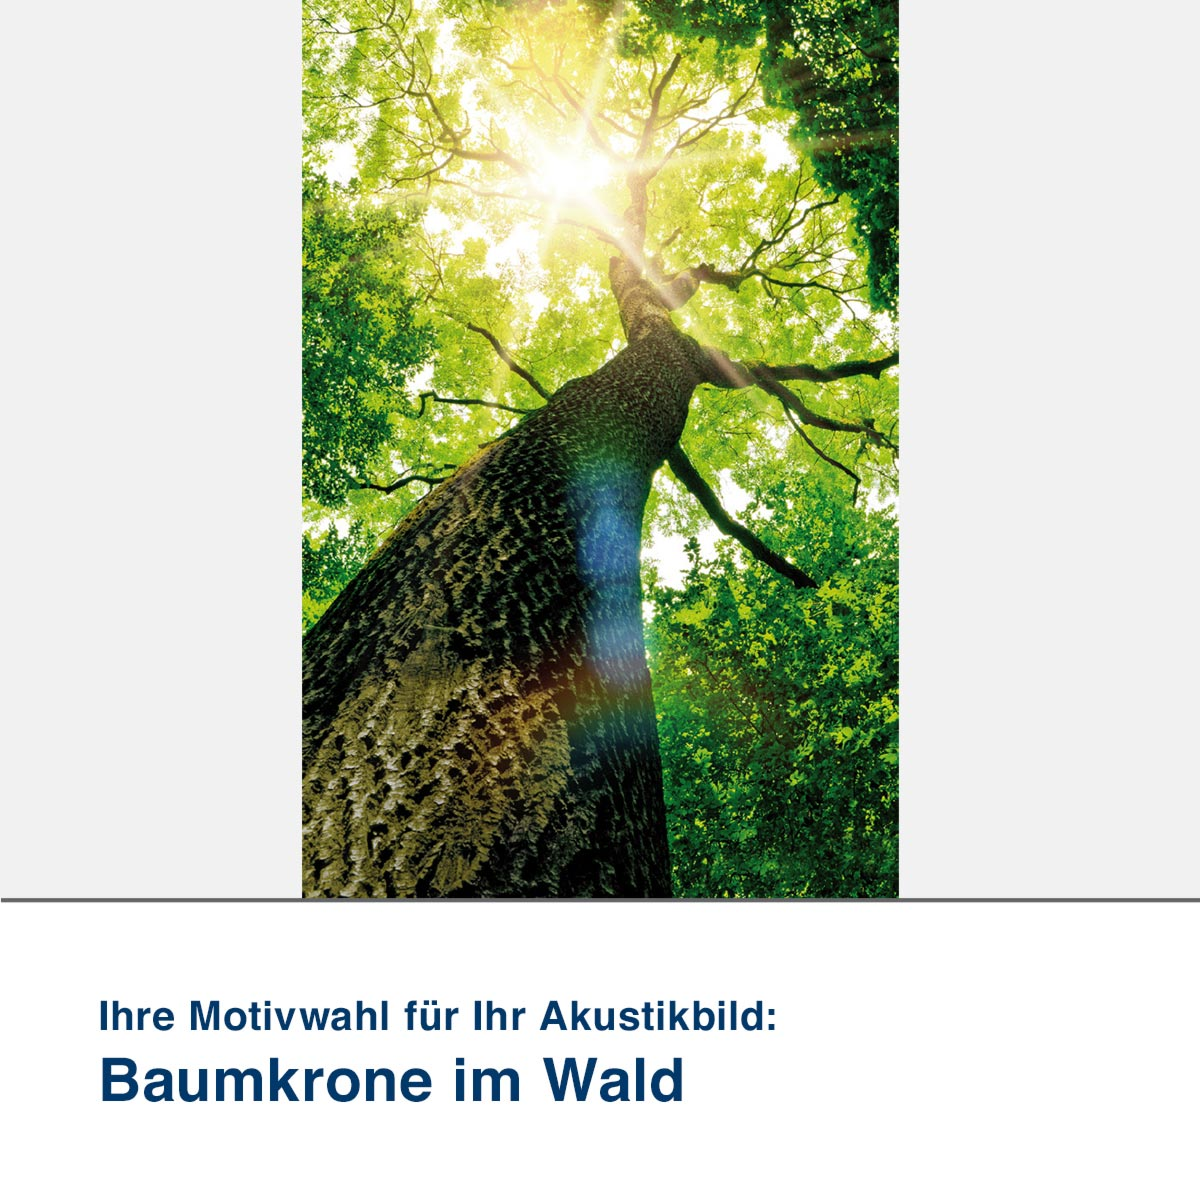 Akustikbild Motiv Baumkrone im Wald